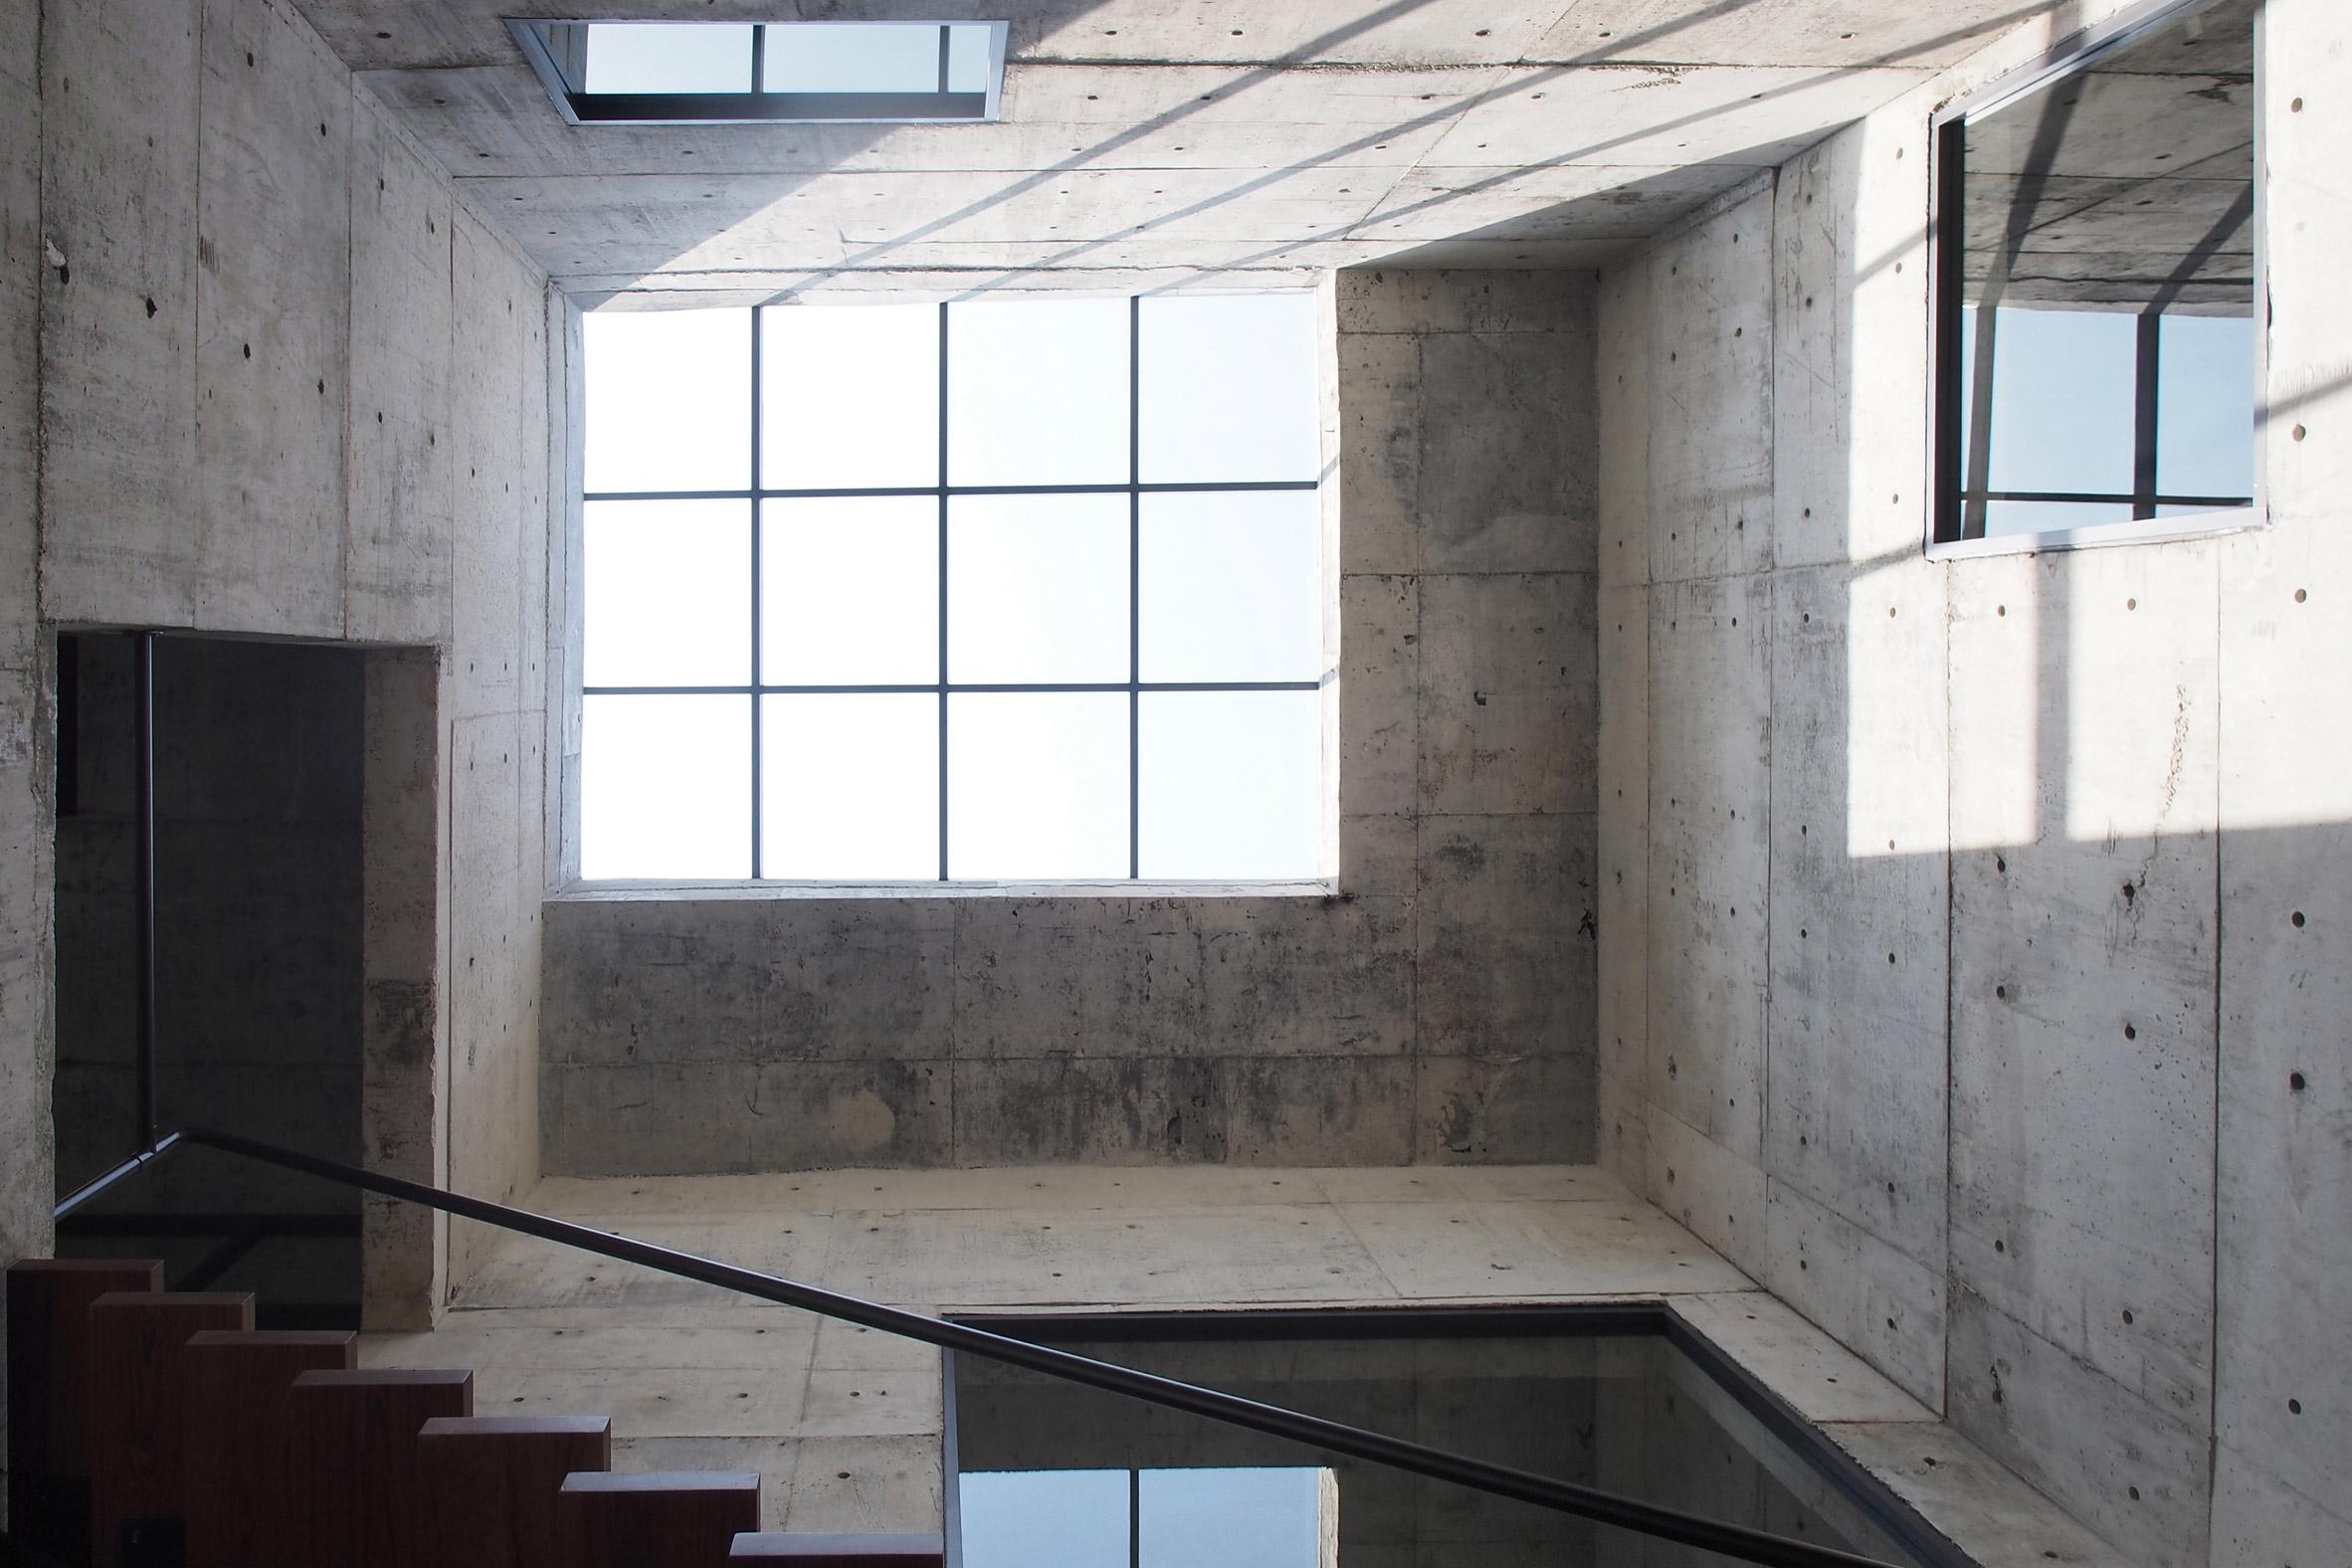 solid-concrete-gallery-as-living-artwork-aswa-architecture-bangkok-thailand_dezeen_2364_col_5.jpg